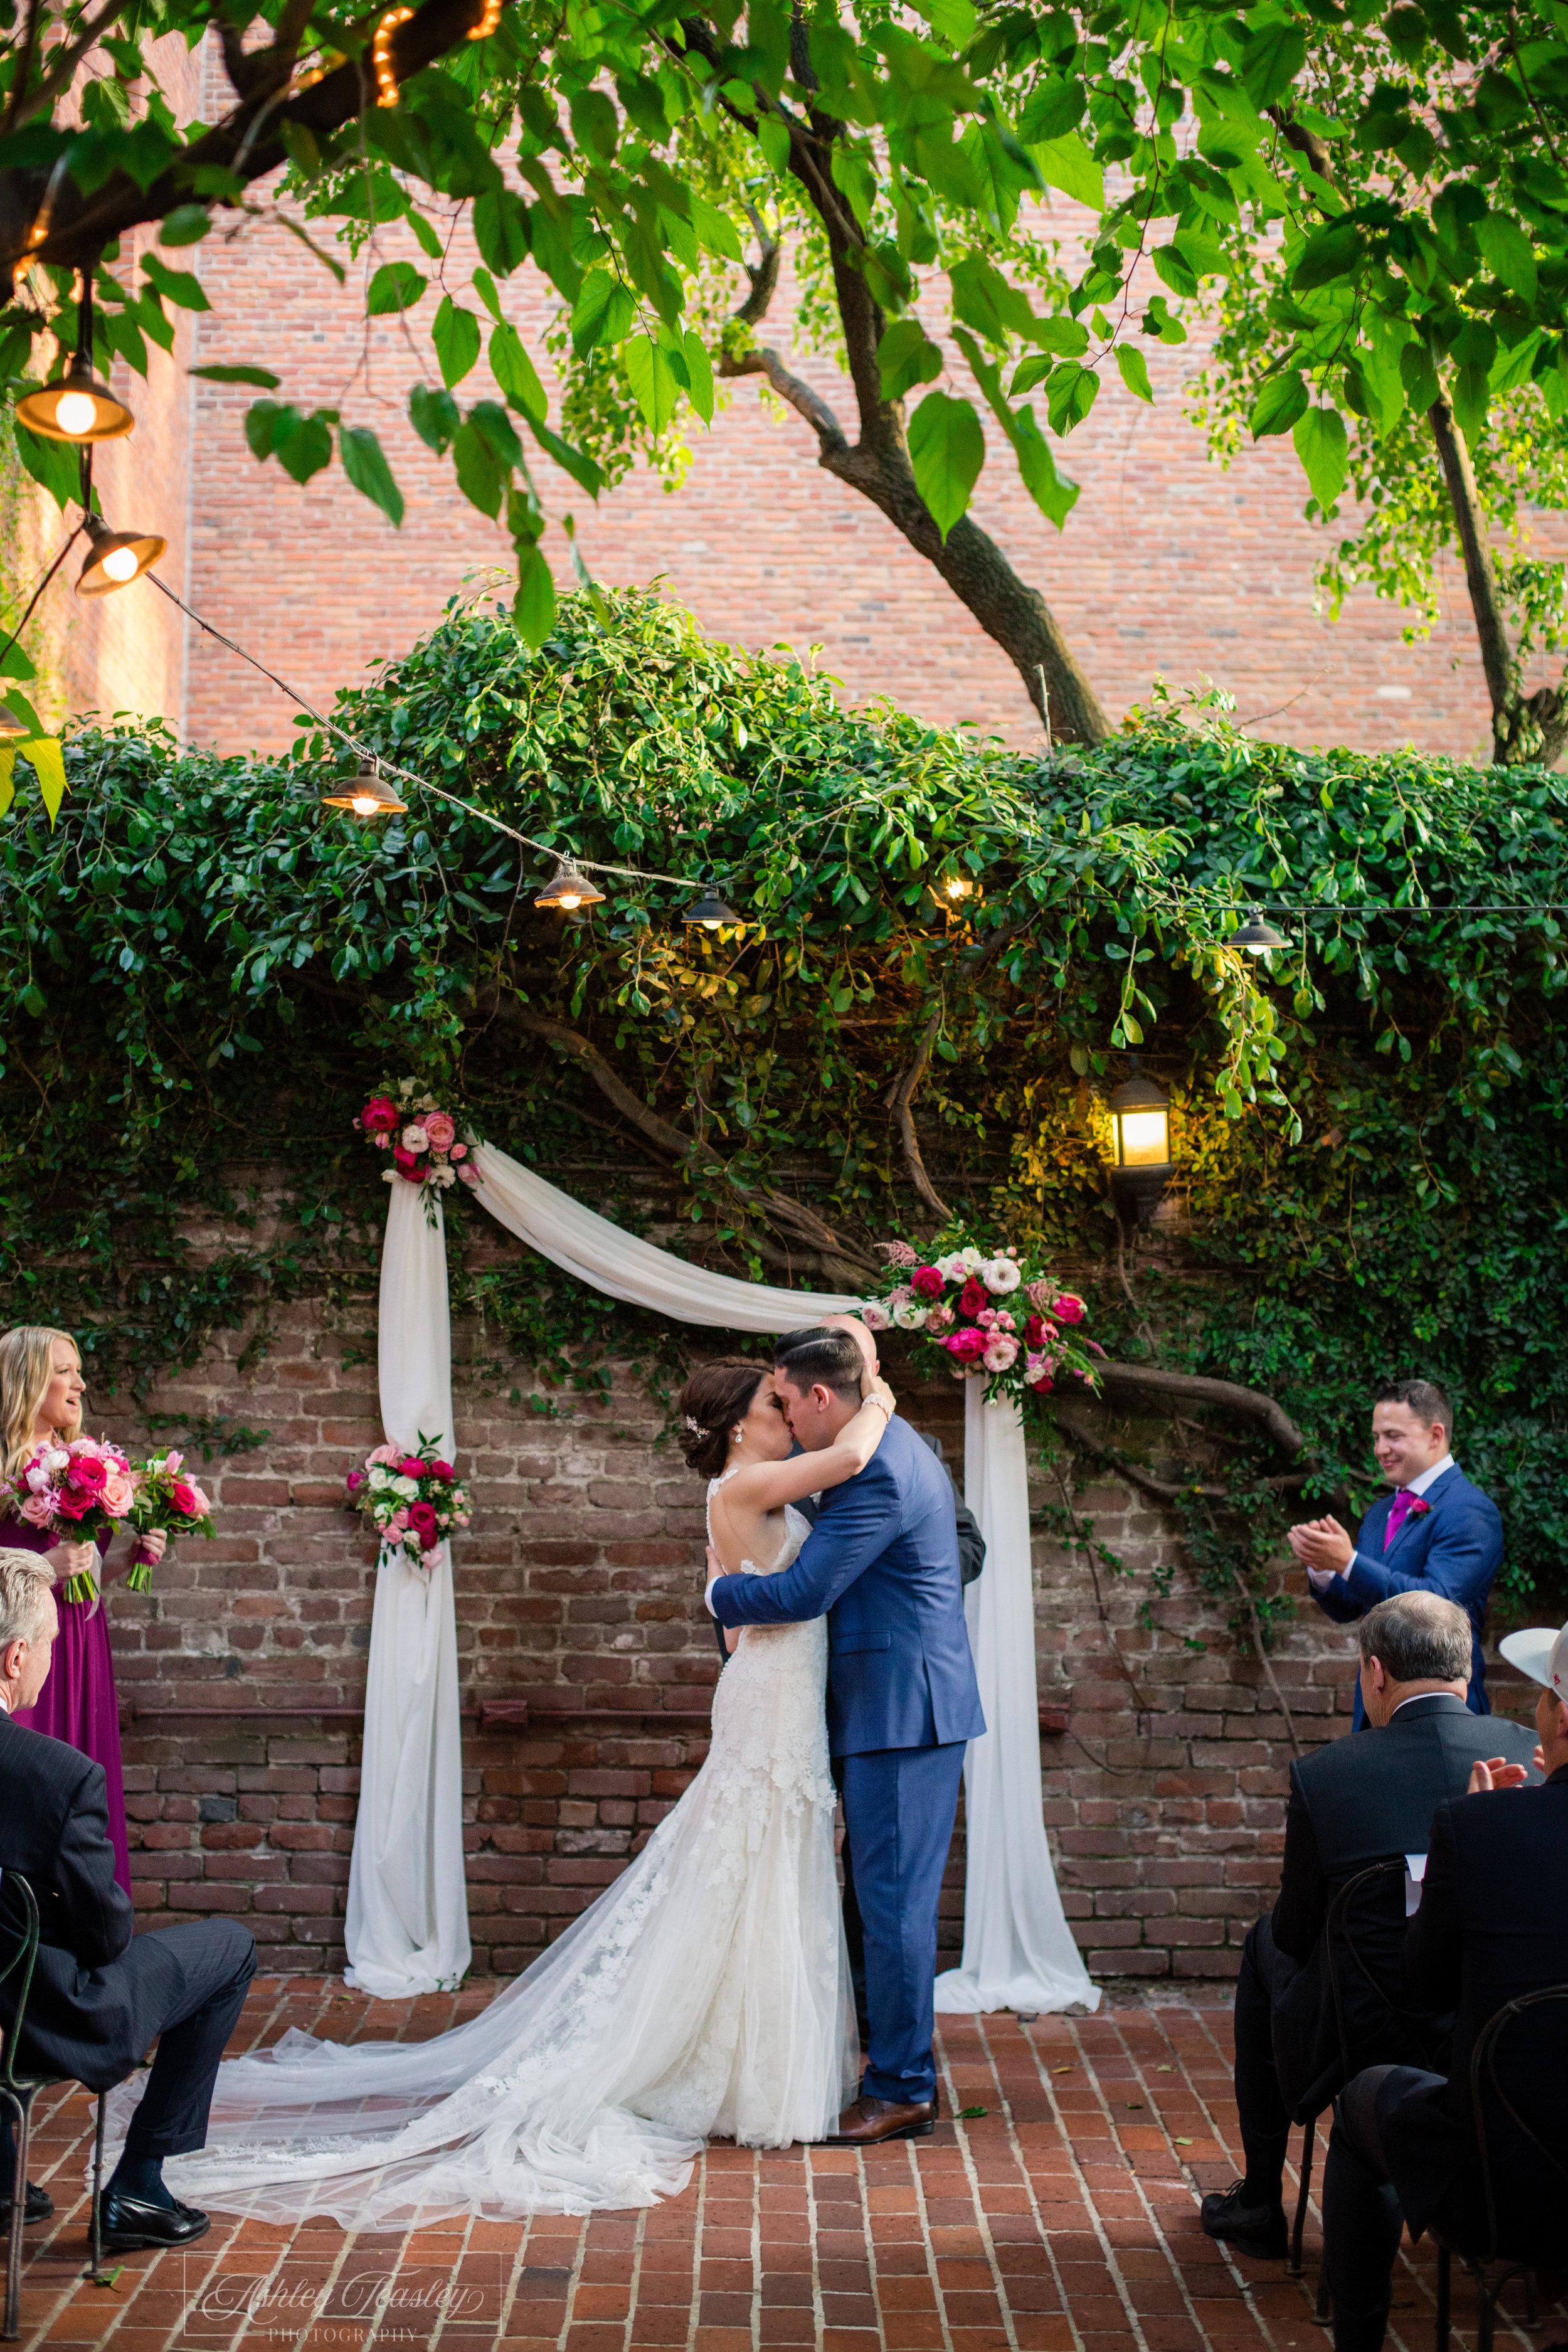 Tarrah & Francisco - The Kimpton Sawyer Hotel - The Firehouse Old Sac - Sacramento Wedding Photographer - Ashley Teasley Photography (388 of 425).jpg